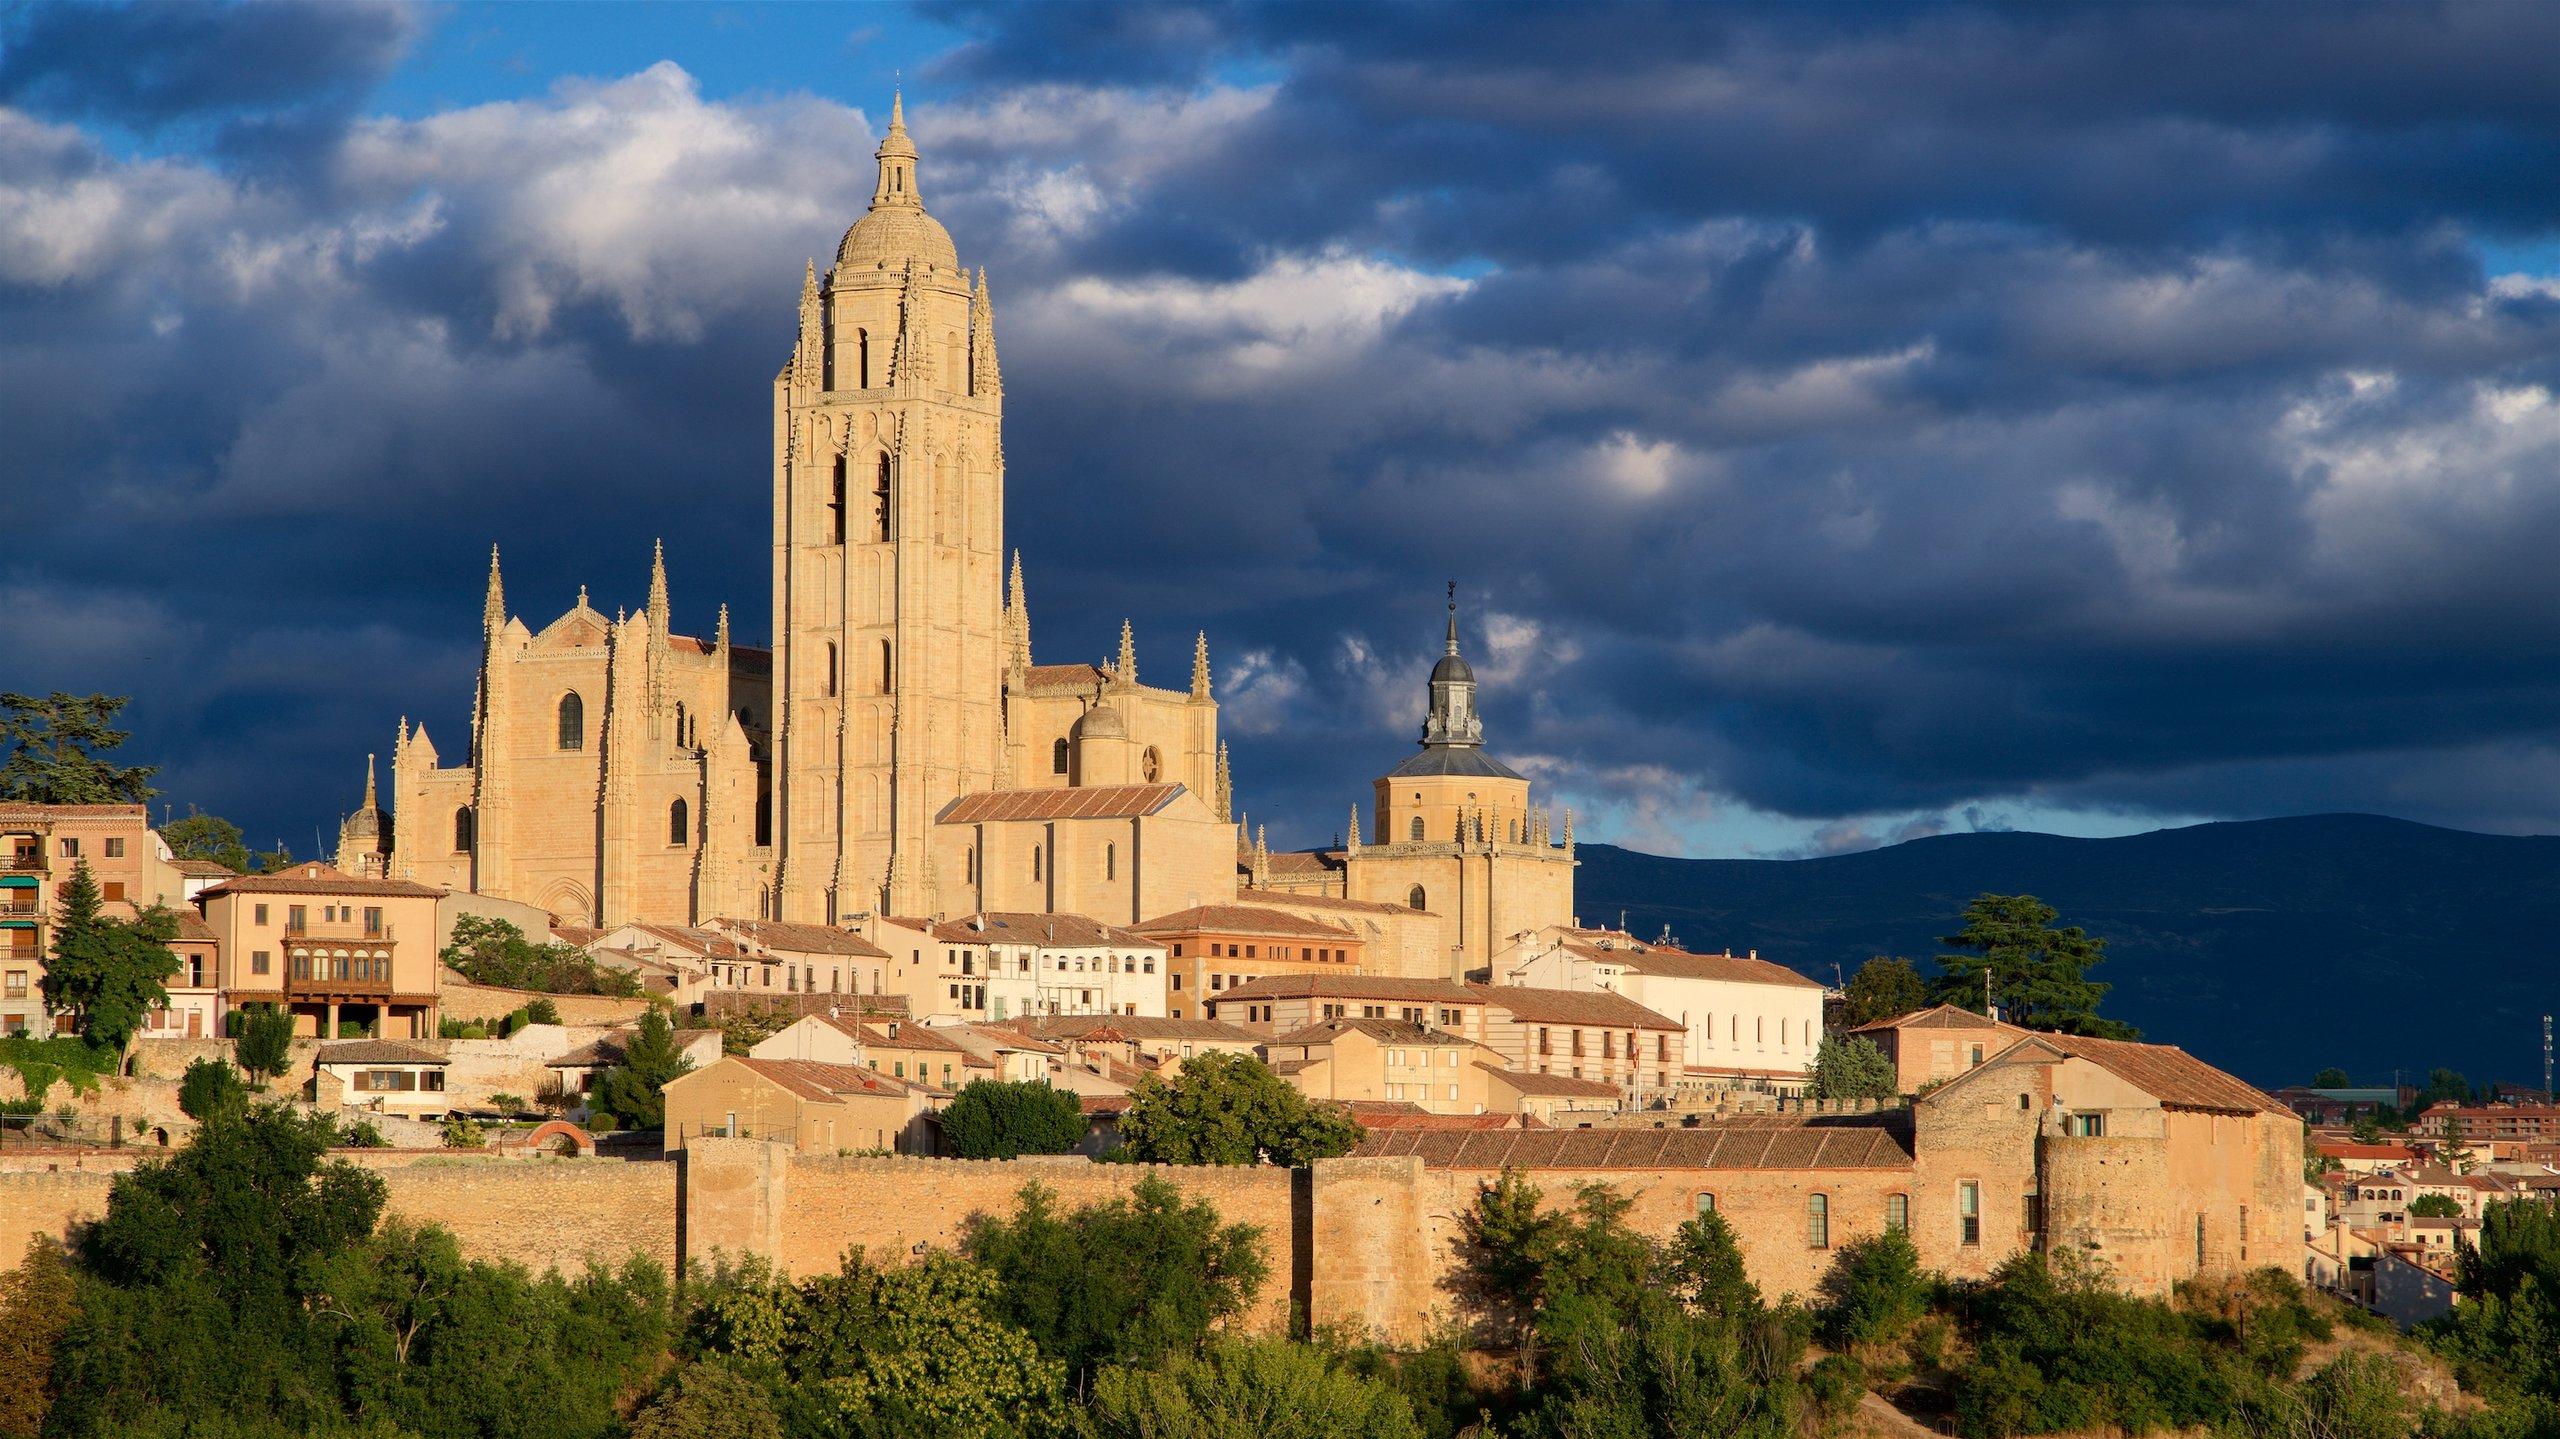 Segovia-kathedraal, Segovia, Castilië en León, Spanje